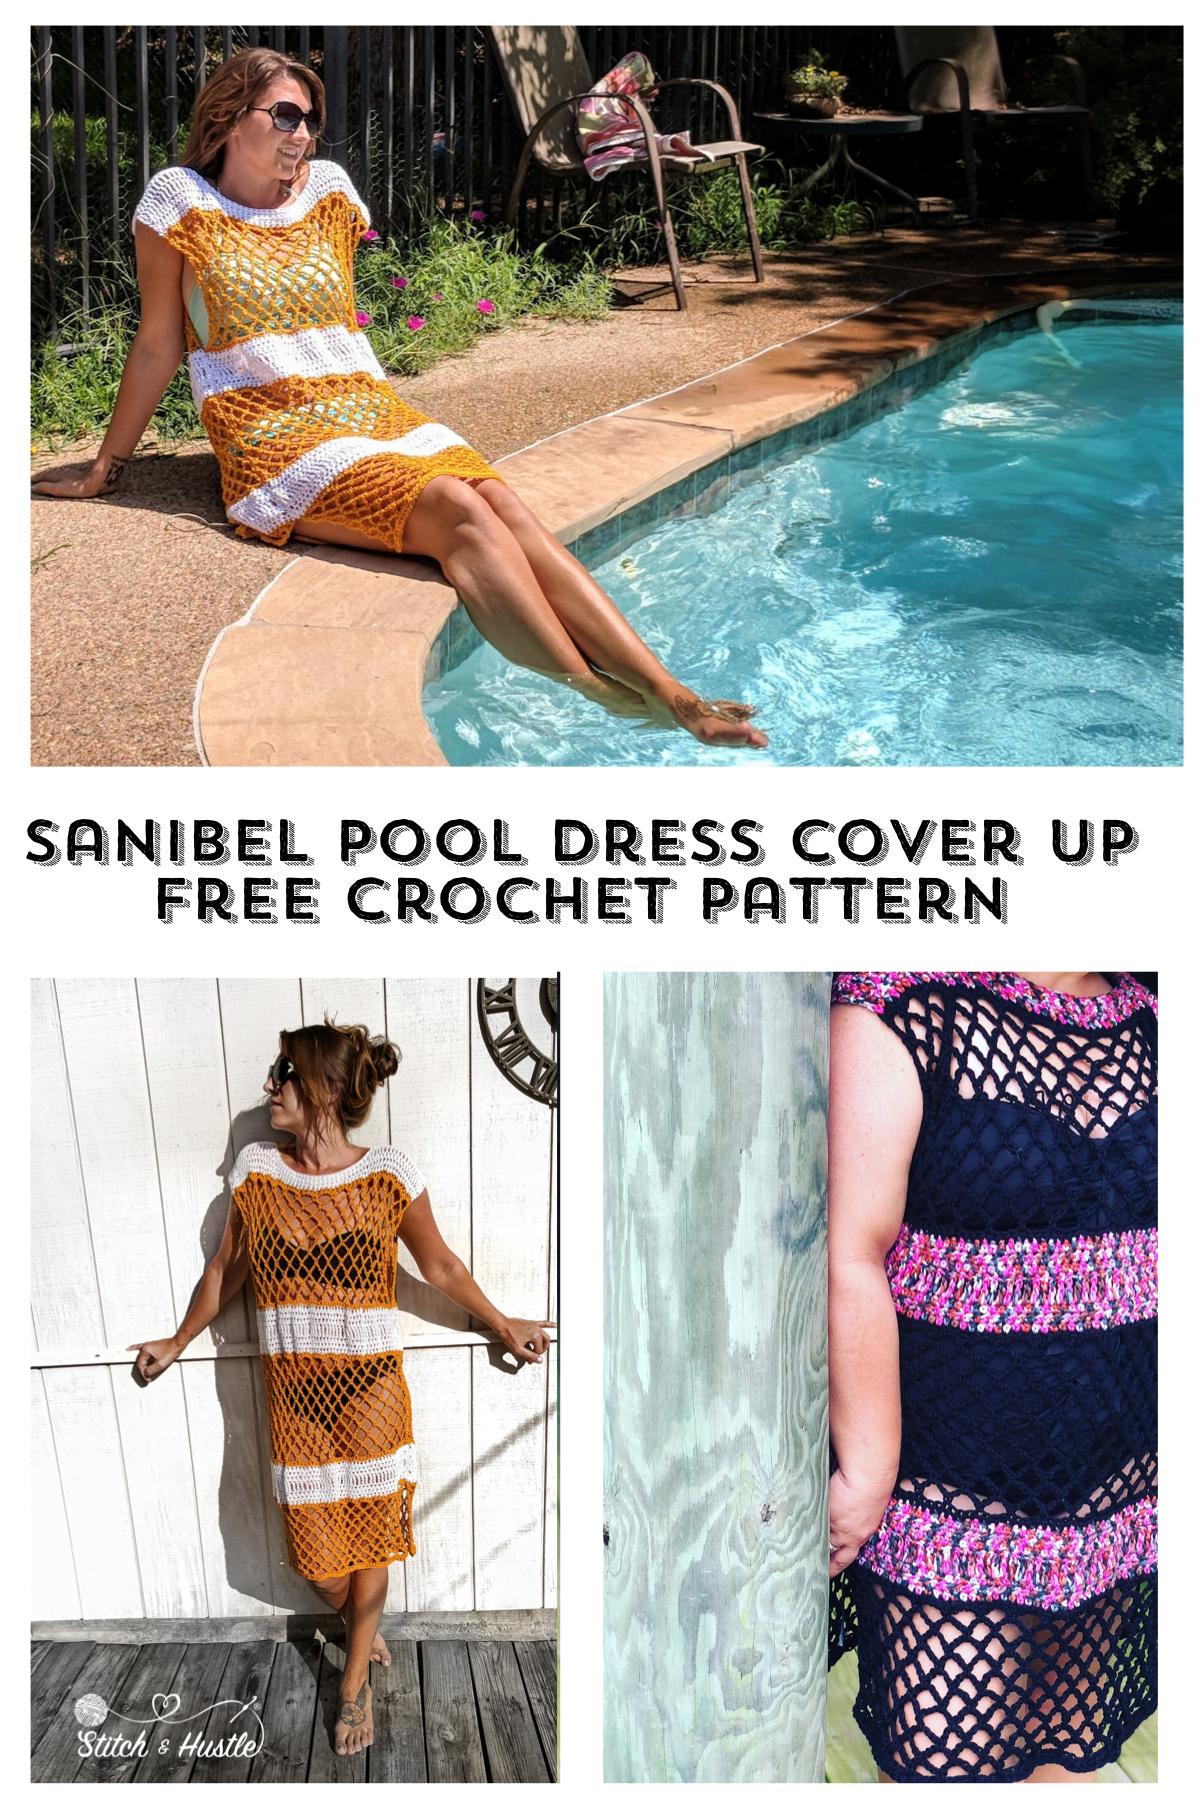 Sanibel_Pool-Dress_free-crochet-pattern82.jpeg